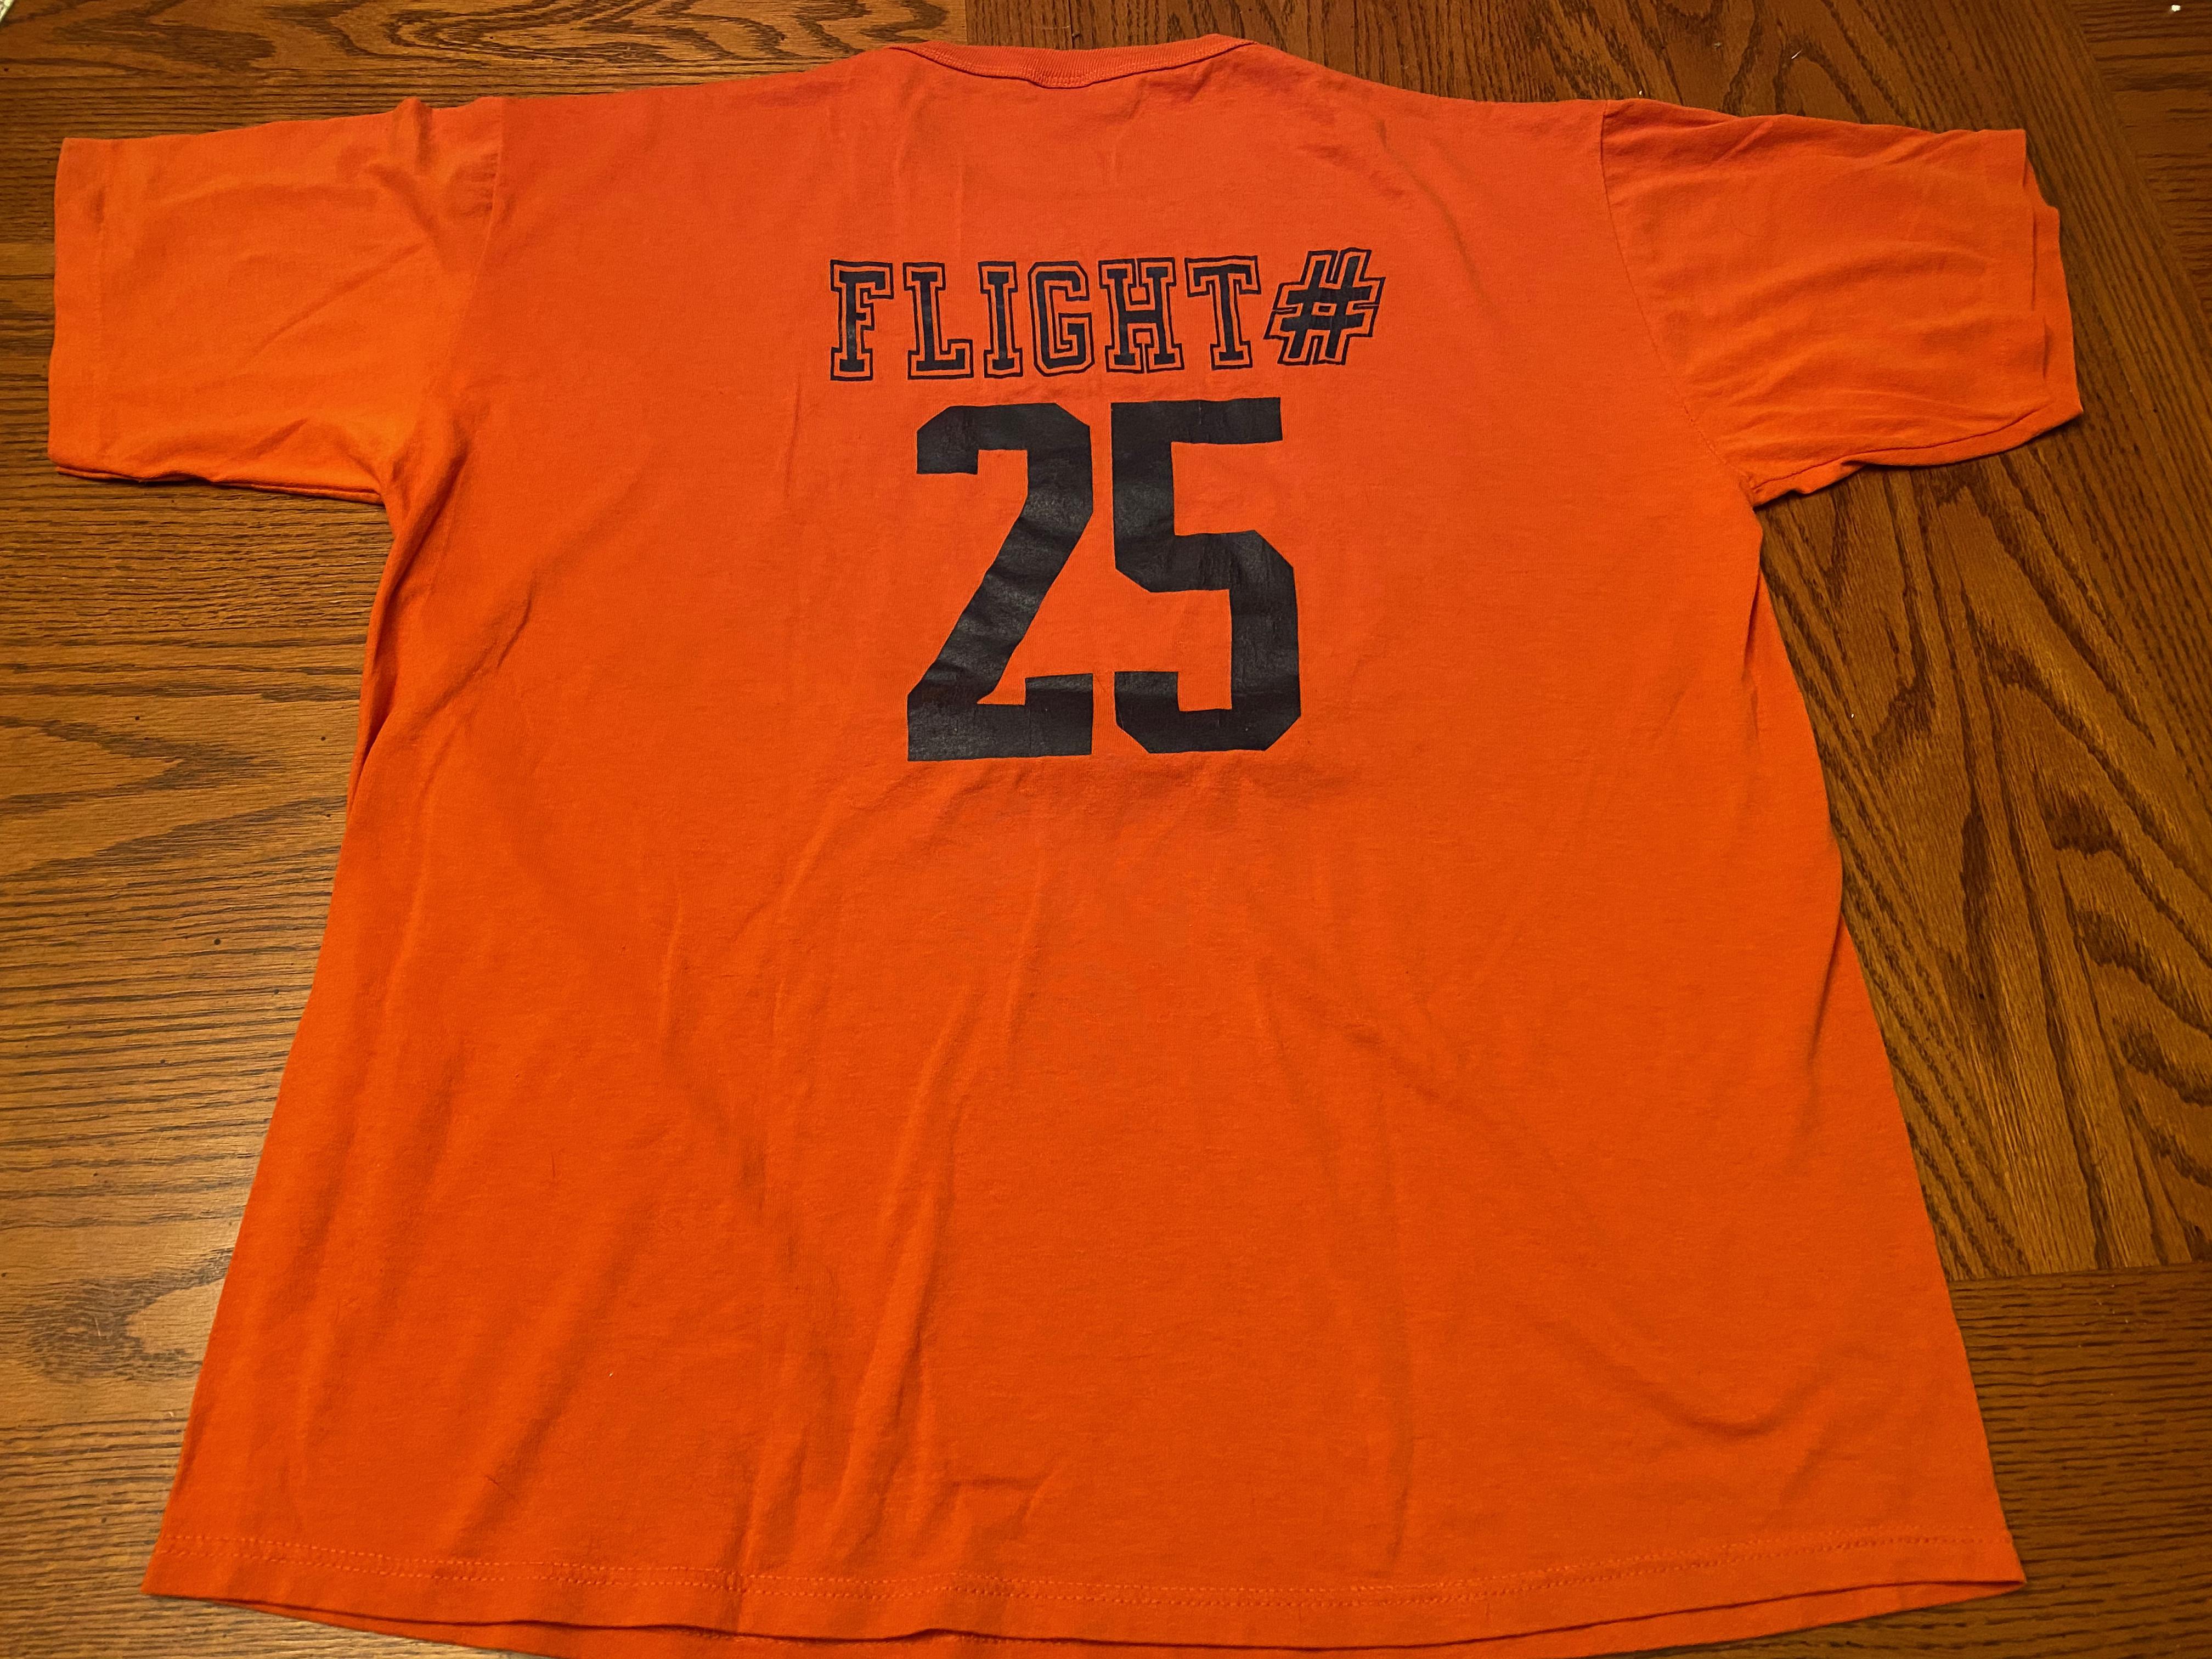 Flight 25 - Nick Anderson